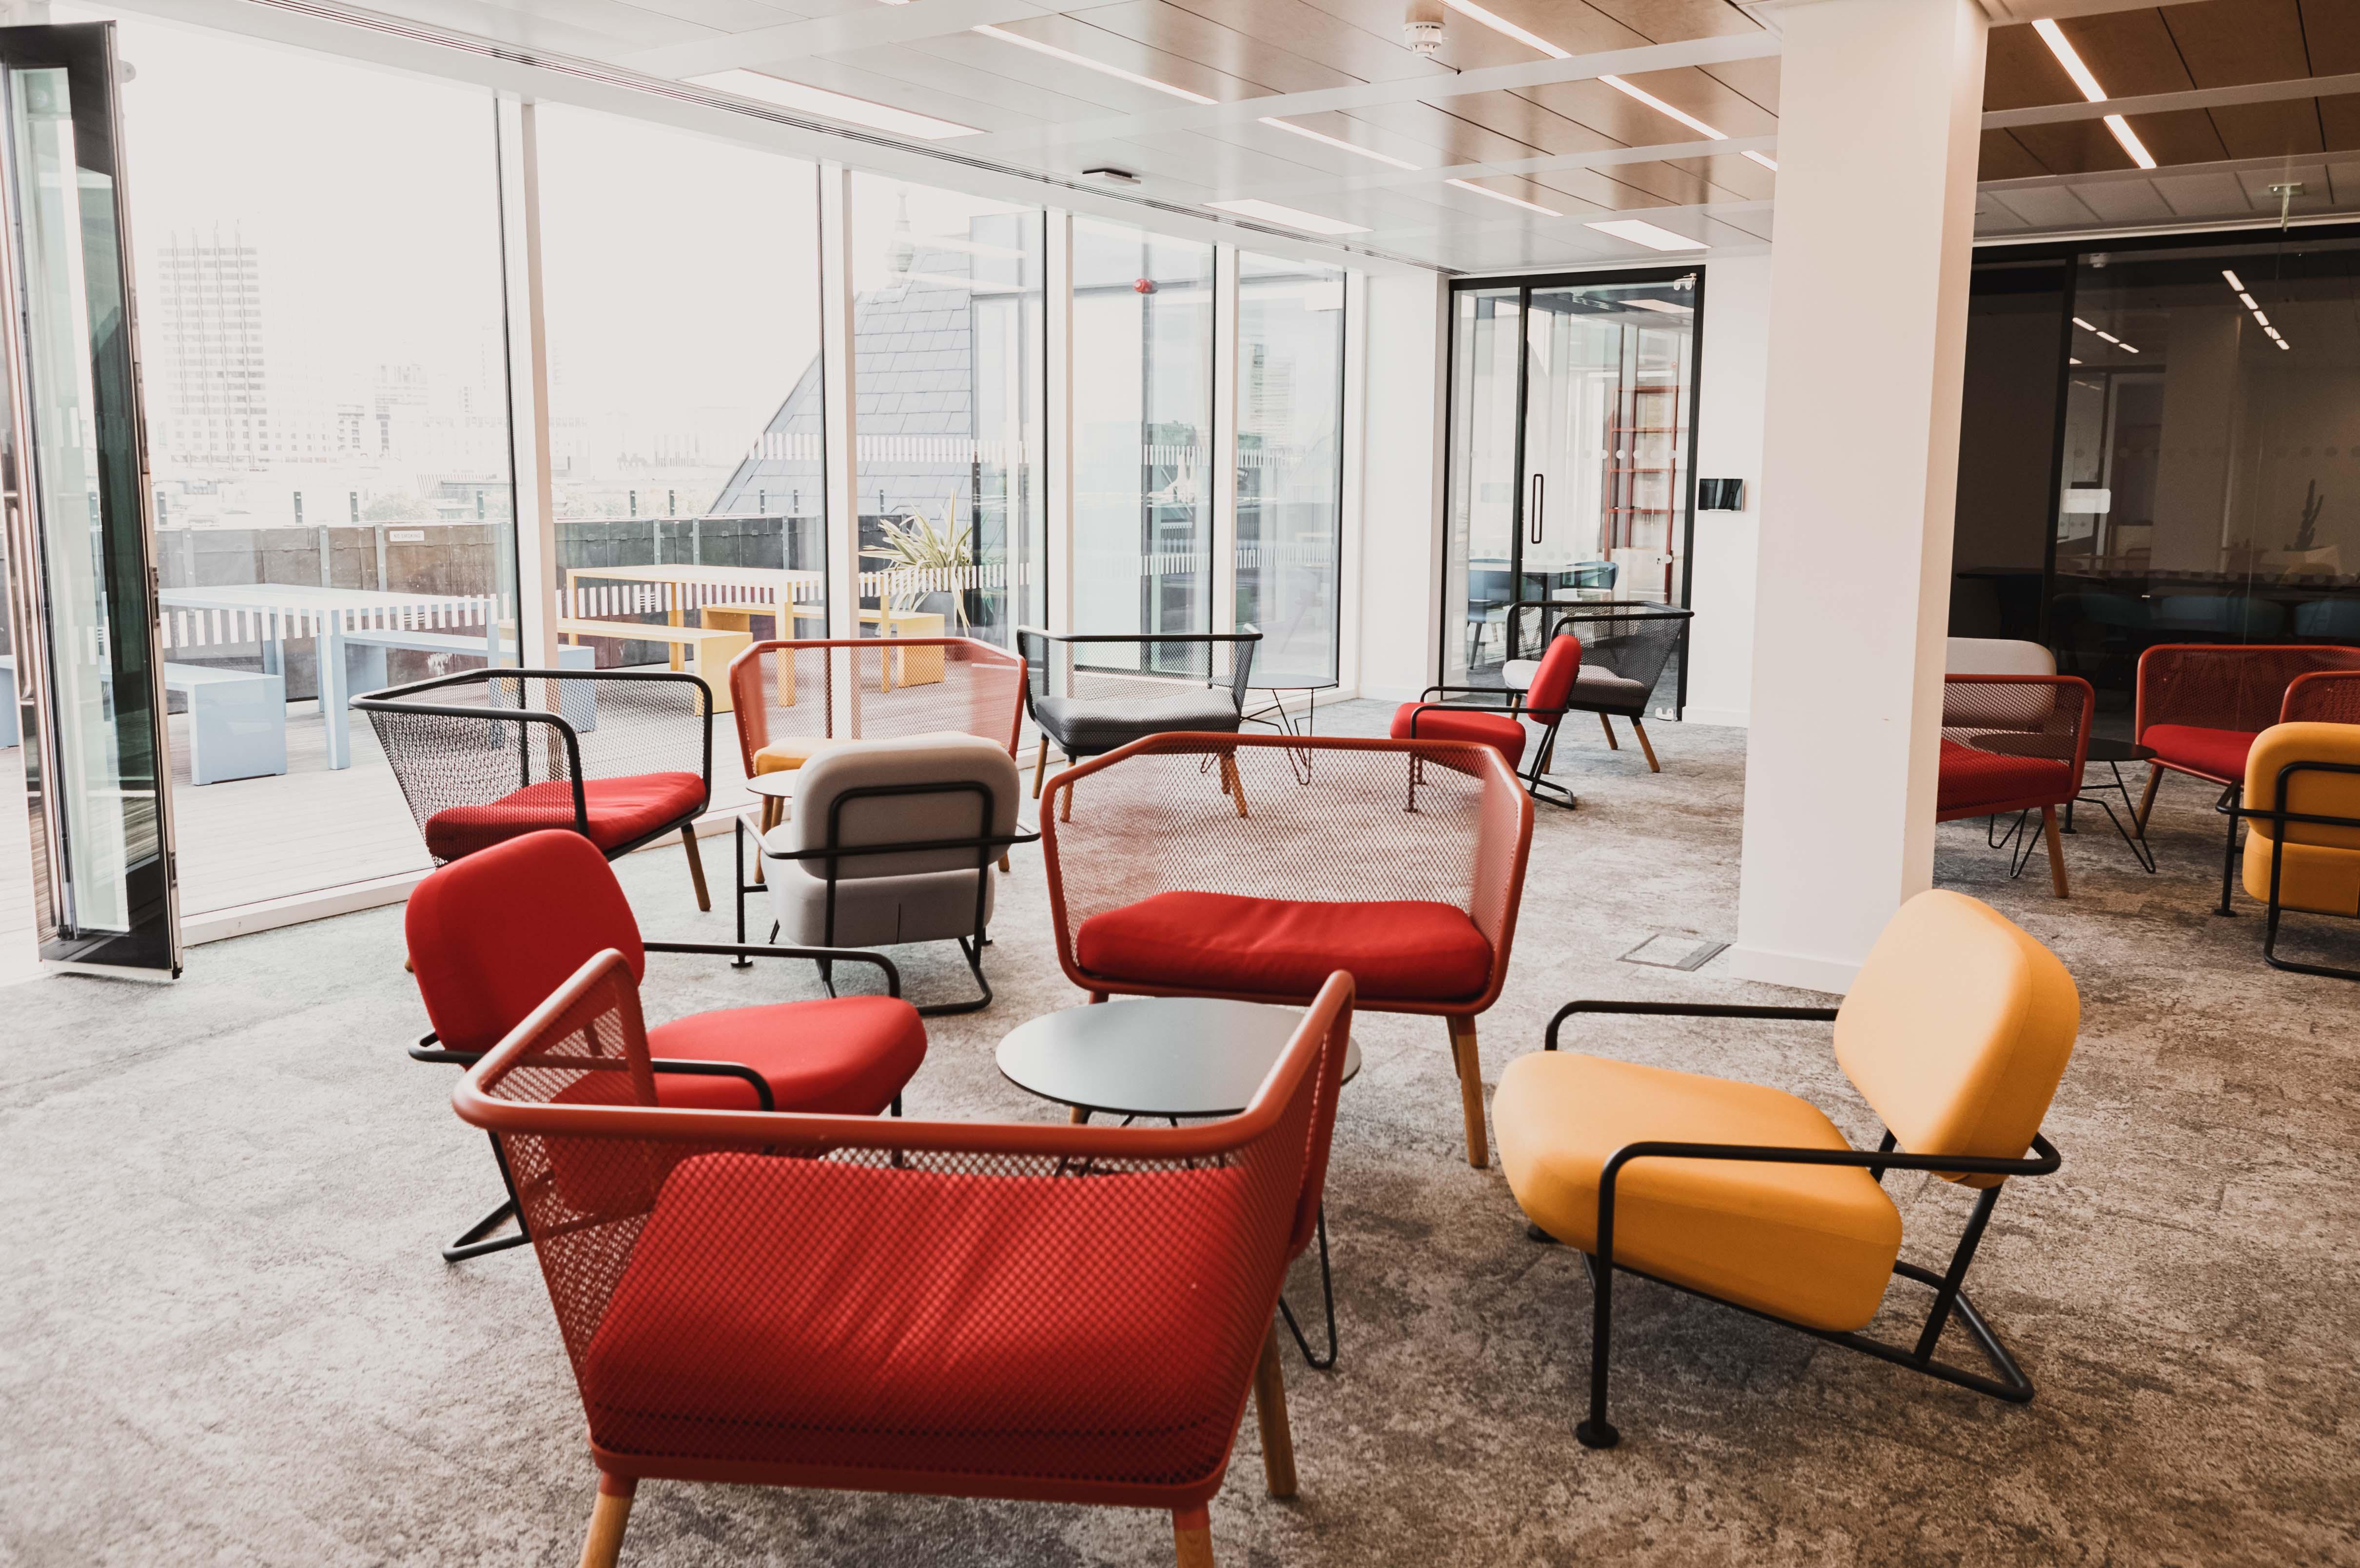 empty-break-room-at-a-modern-business-premises-P5WATS4